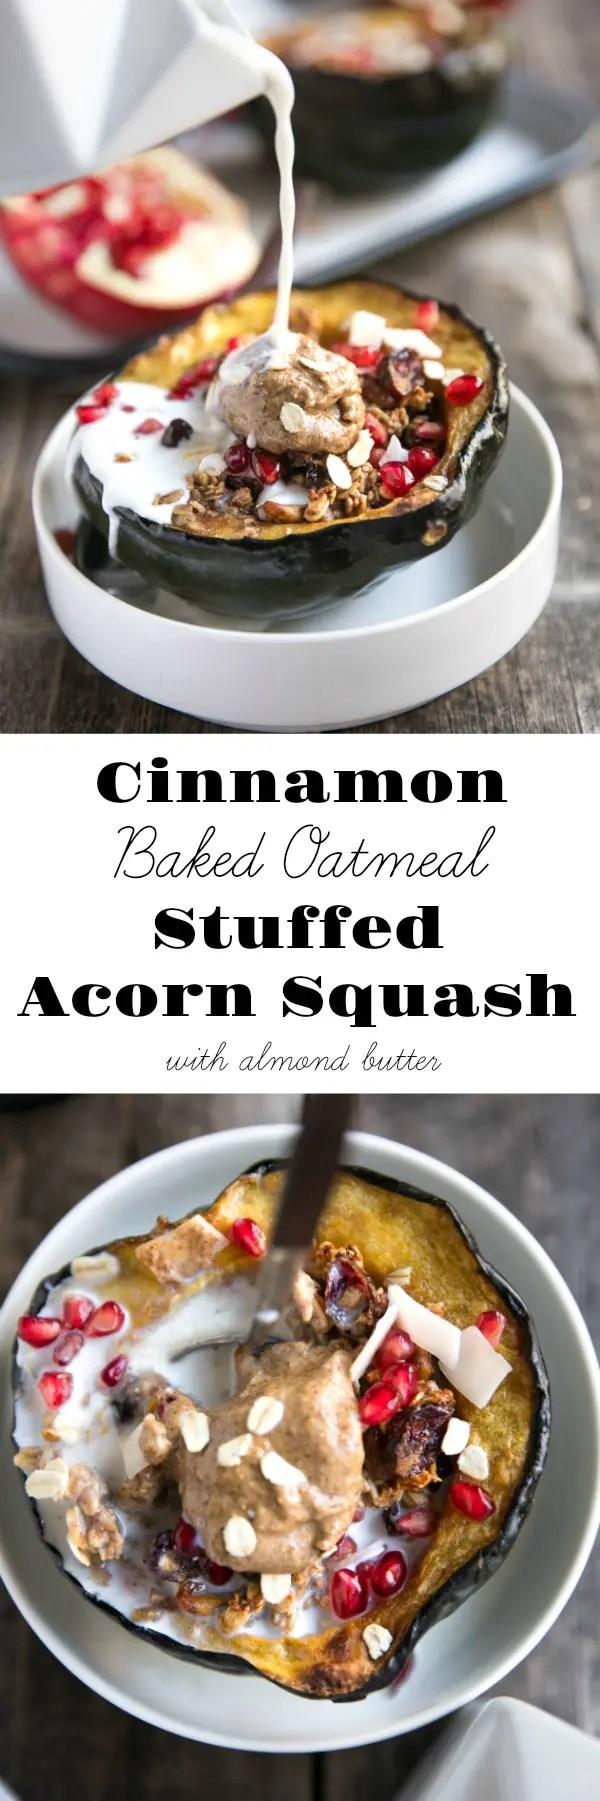 Sweet Cinnamon Baked Oatmeal Stuffed Acorn Squash with Almond Butter via @theforkedspoon #breakfast #glutenfree #acornsquash #almondbutter